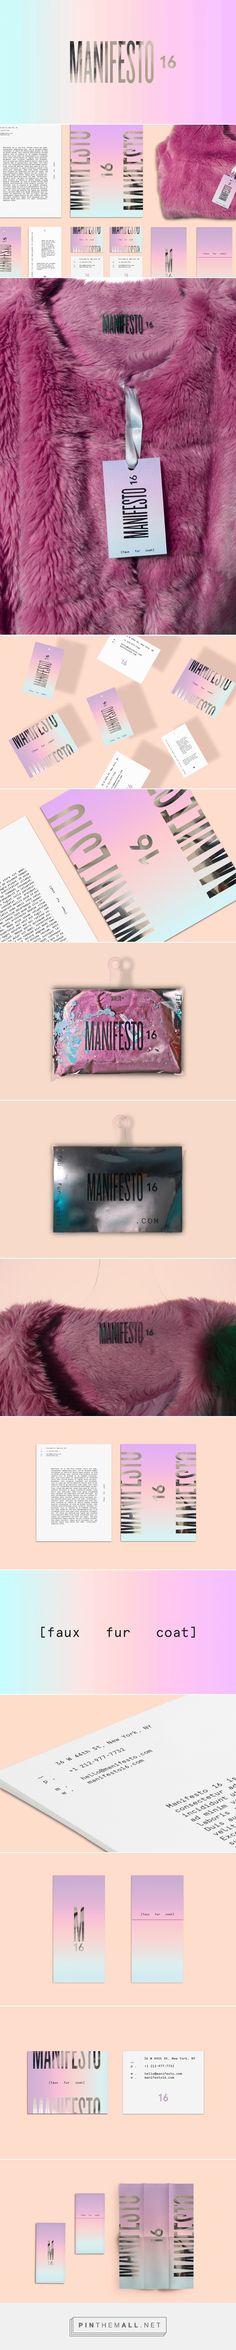 MANIFESTO 16 Fashion Branding by Karen Castellanos | Fivestar Branding Agency – Design and Branding Agency & Inspiration Gallery